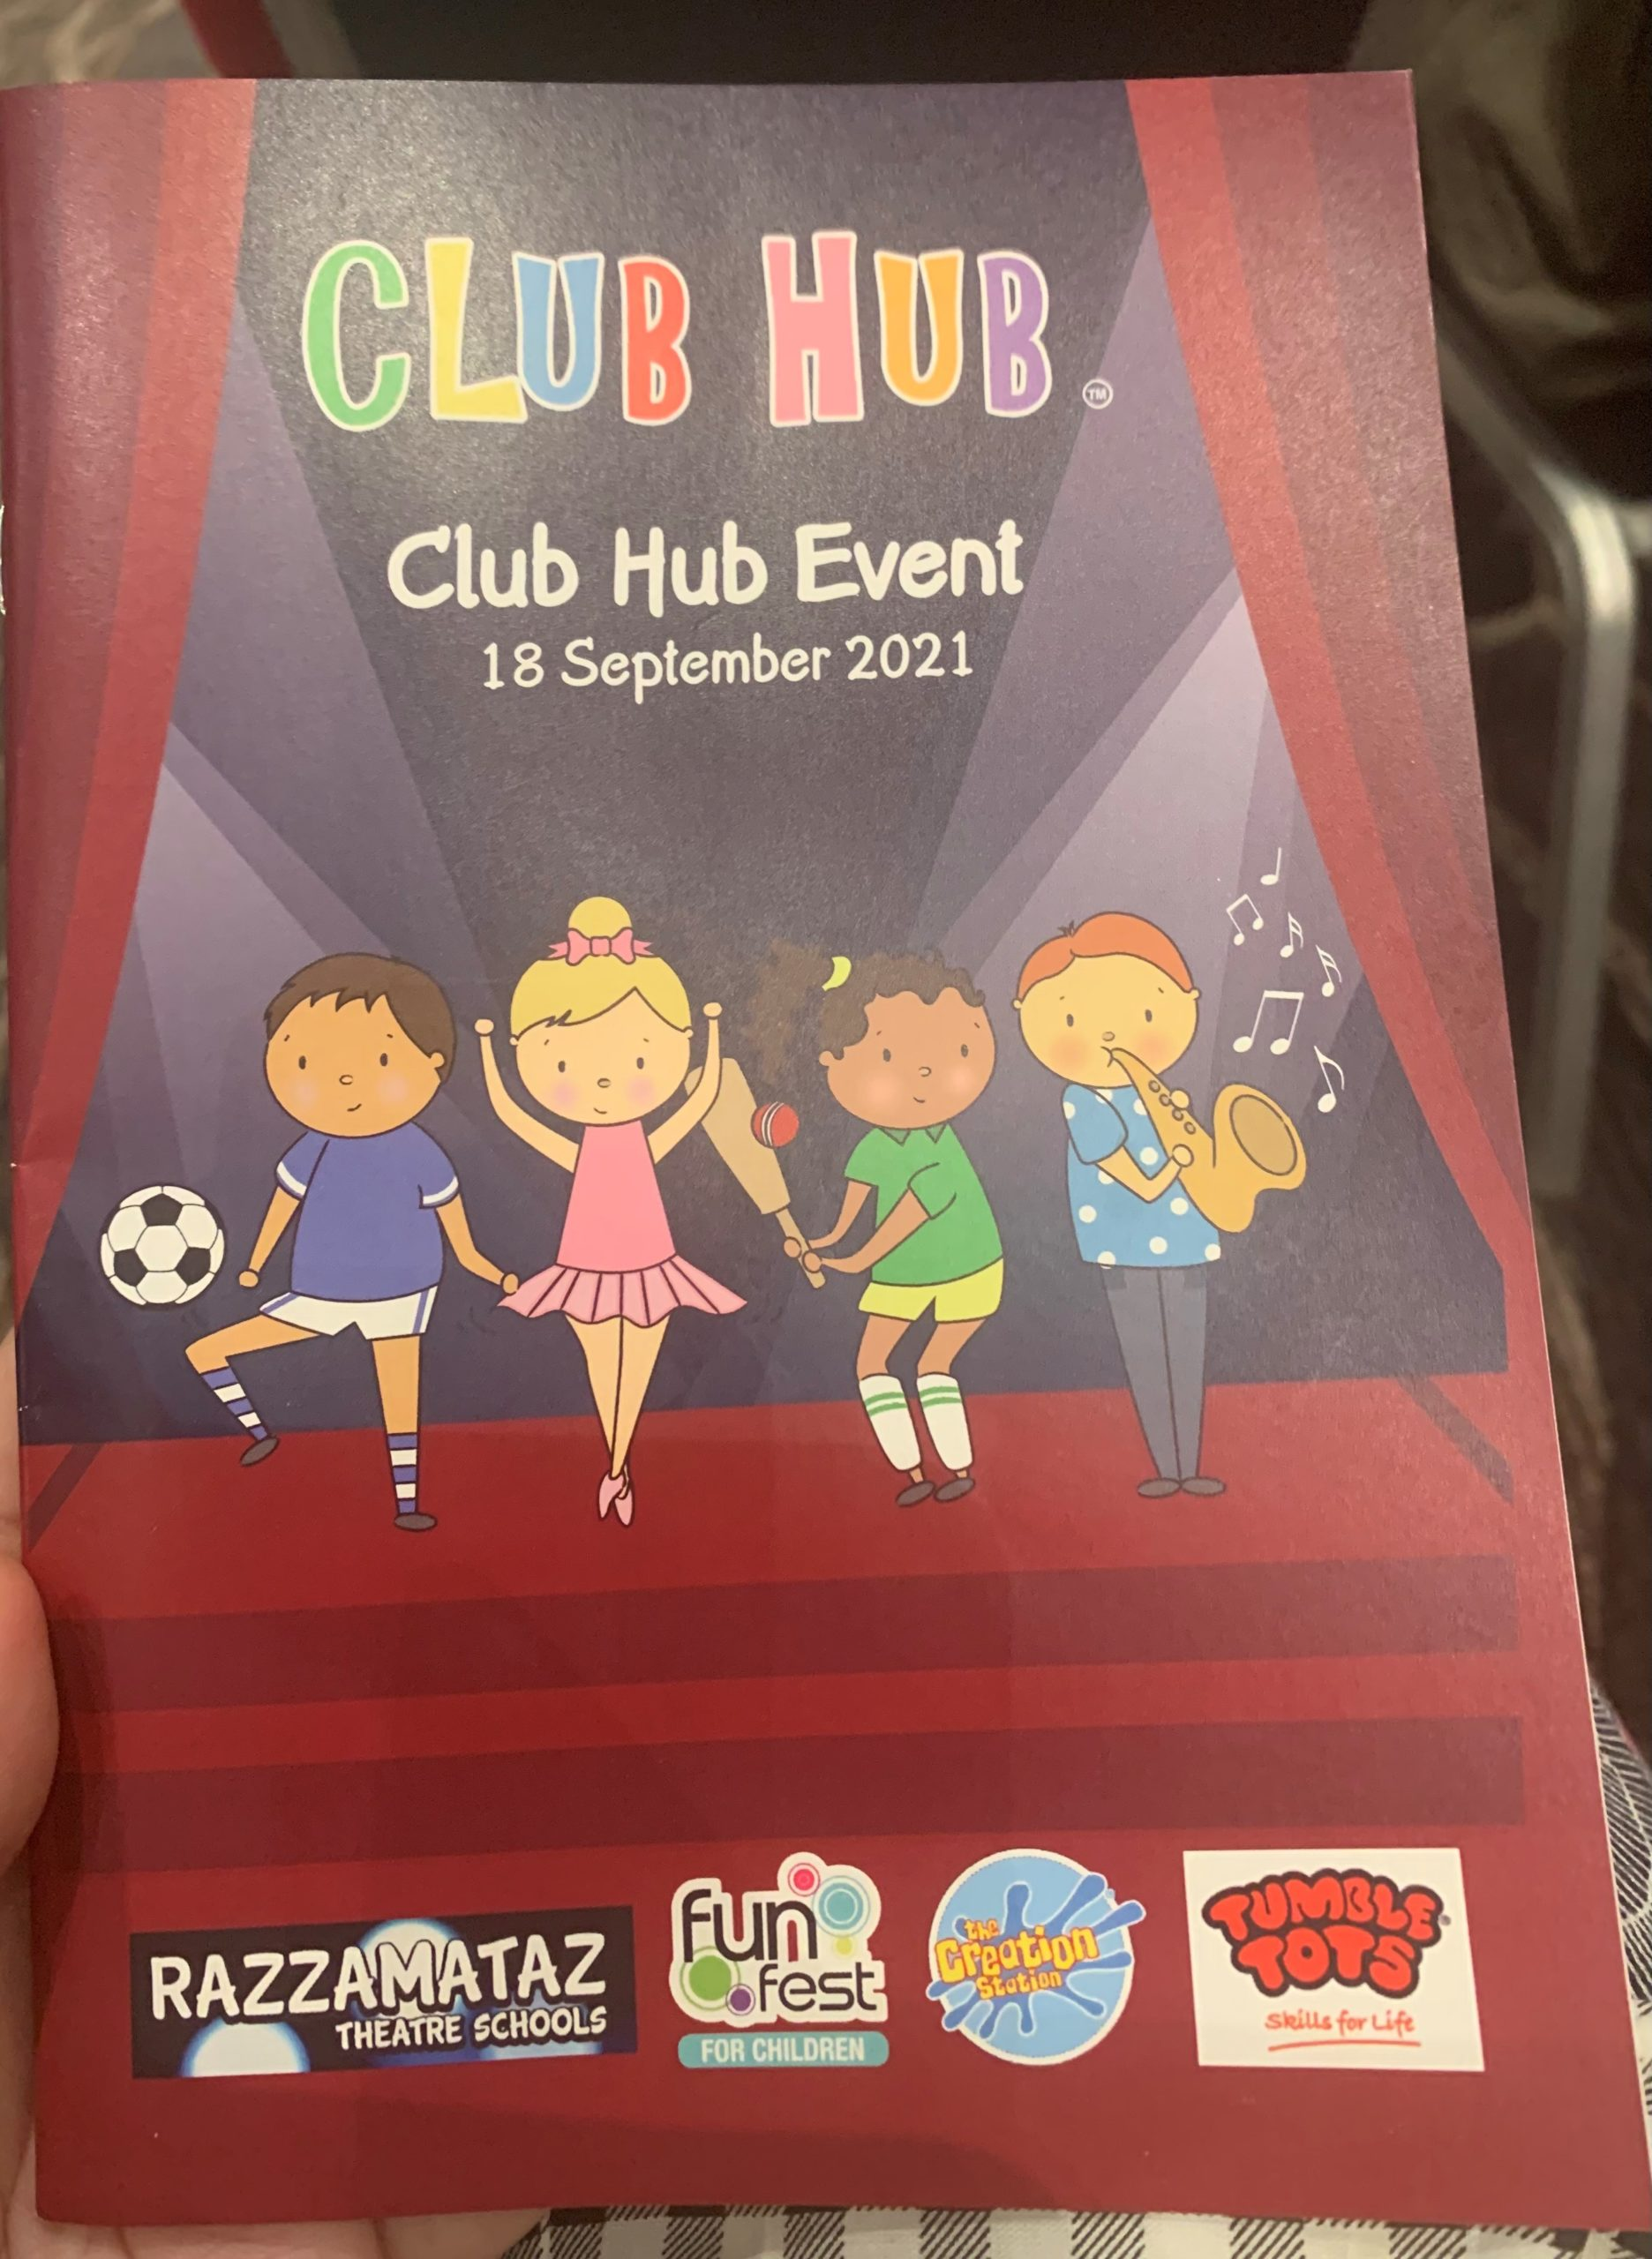 Club Hub Kids Activities Award programme